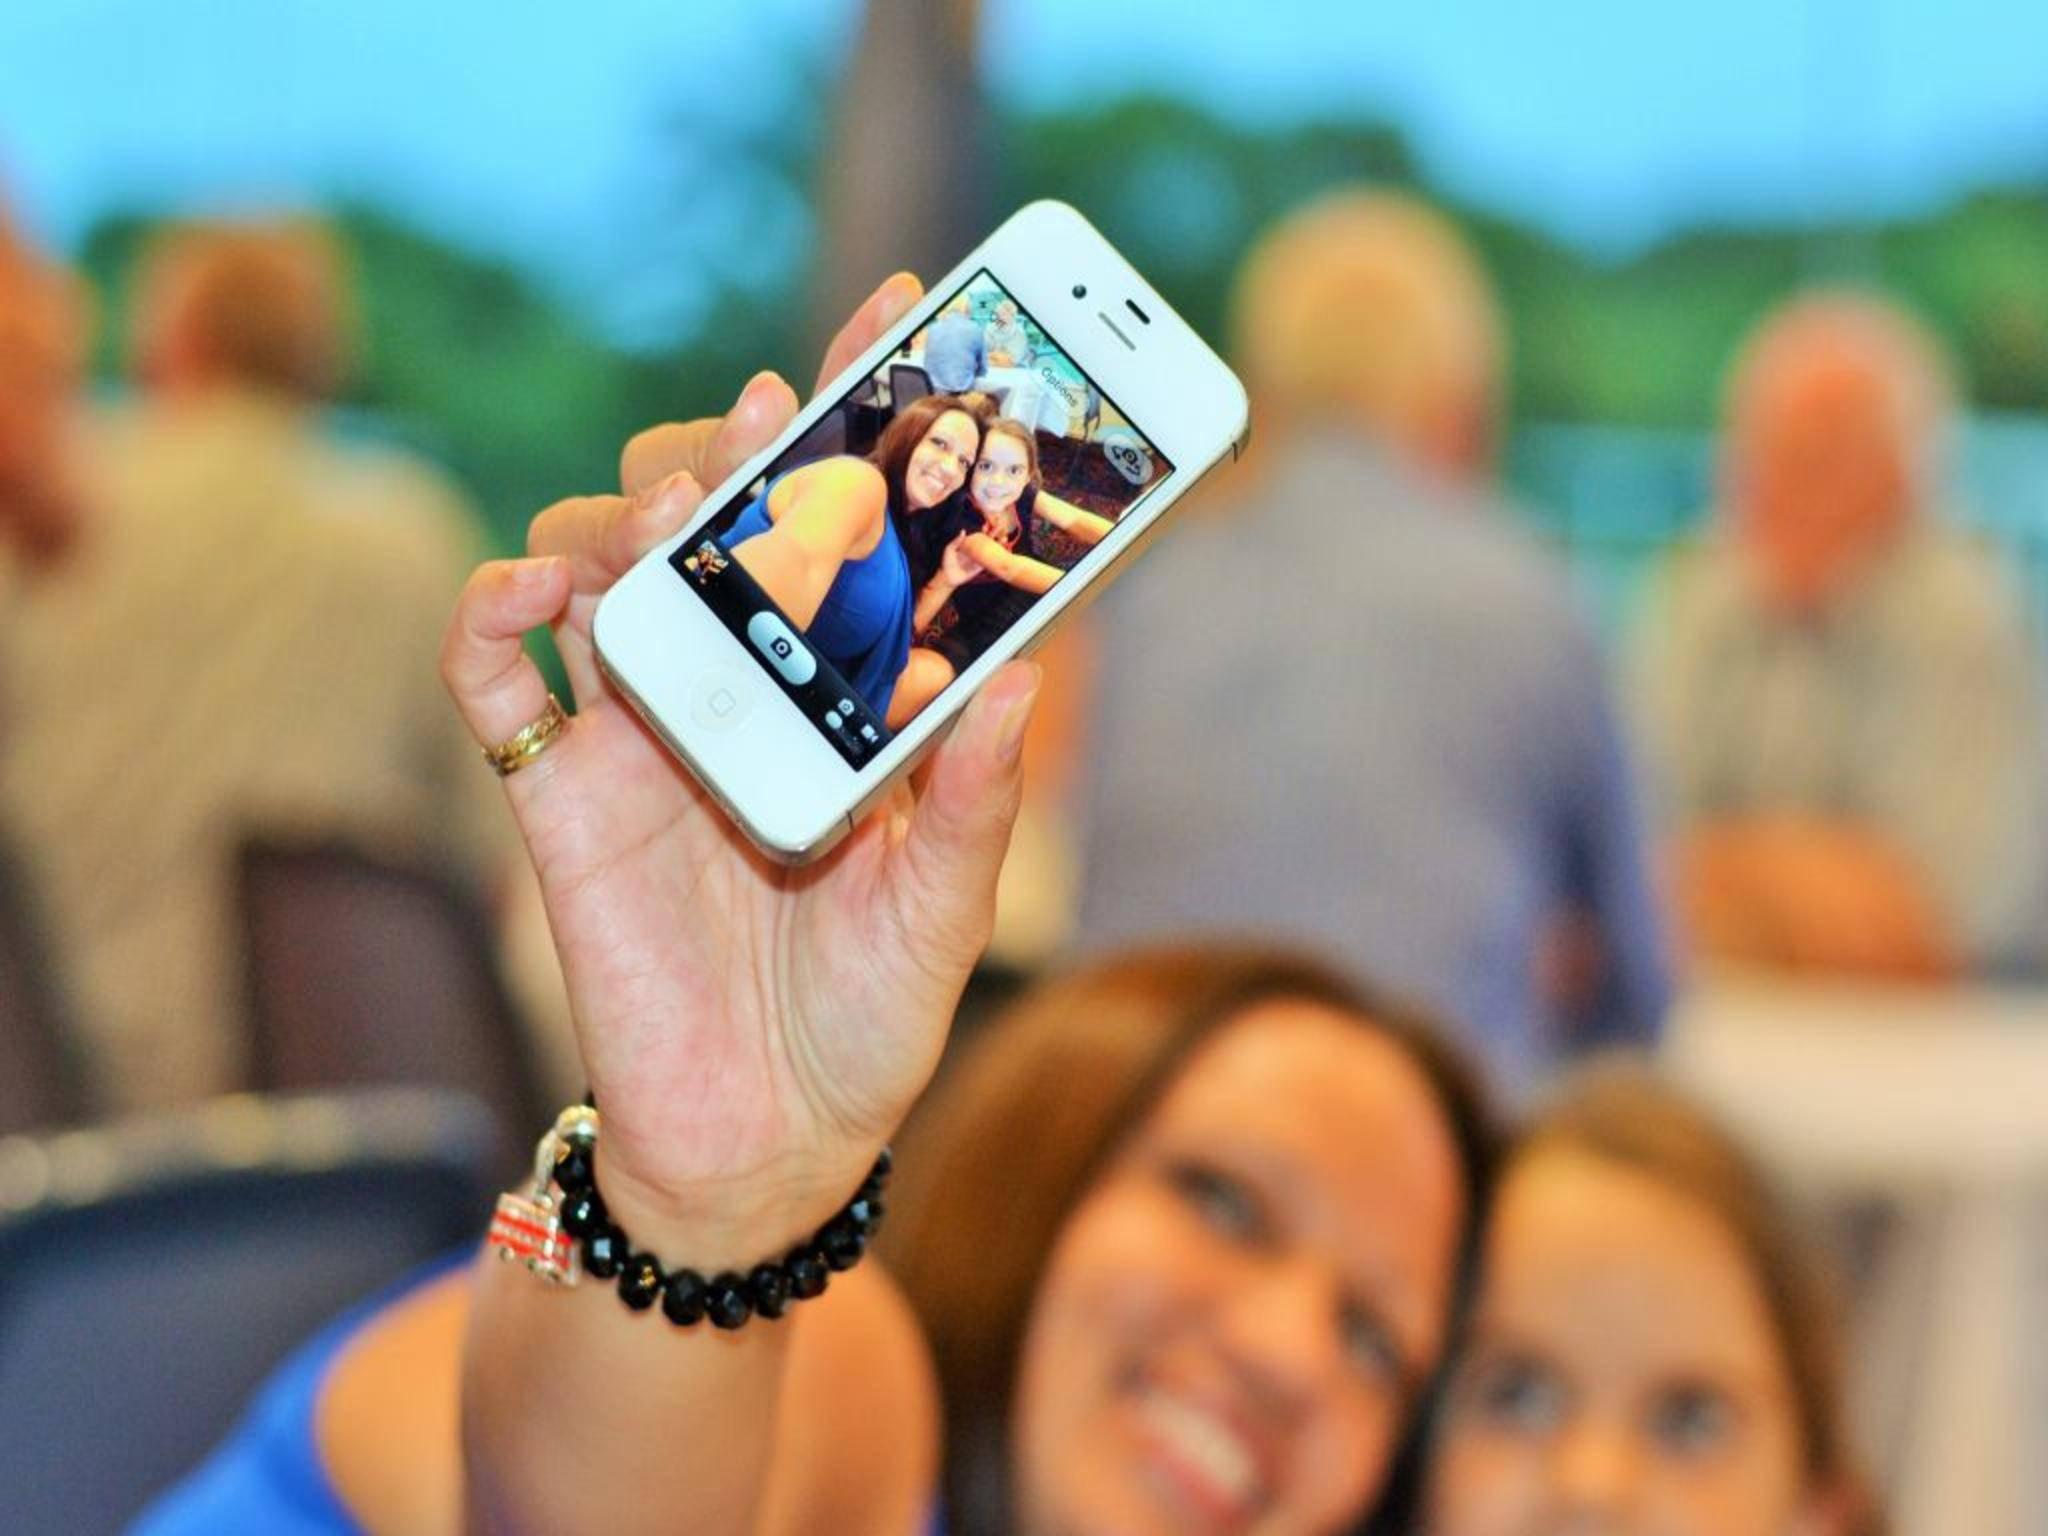 Microsofts neueste iOS-App dreht sich um Selfies.